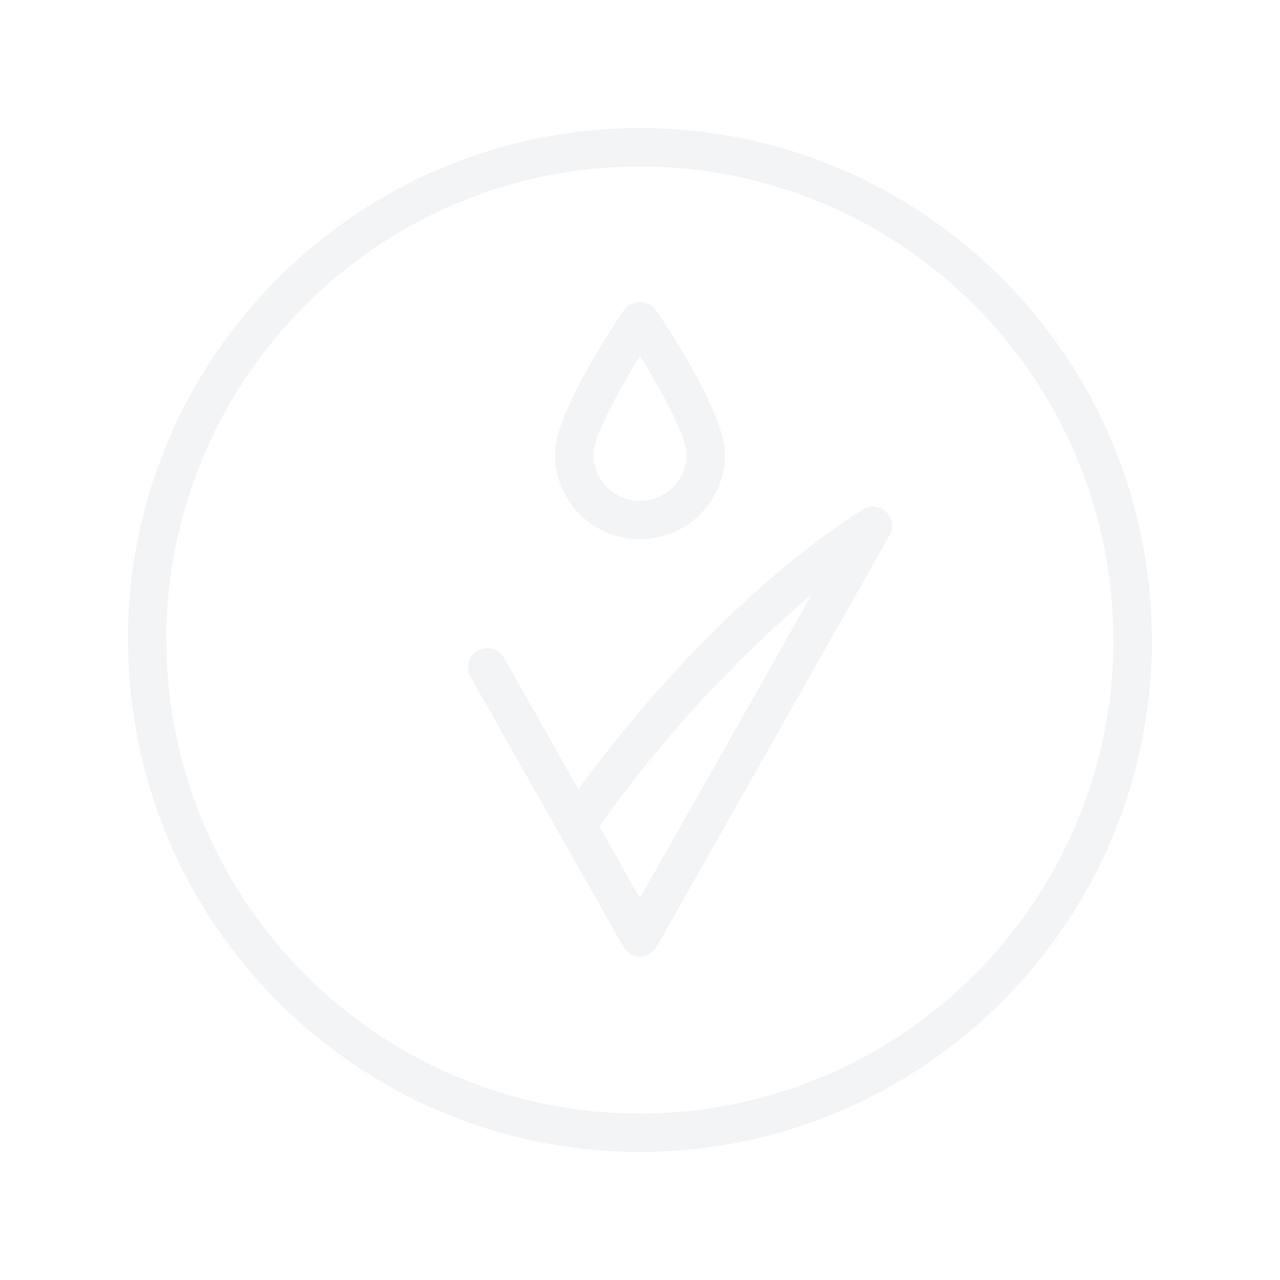 MIZON Correct Liquid Foundation 30g